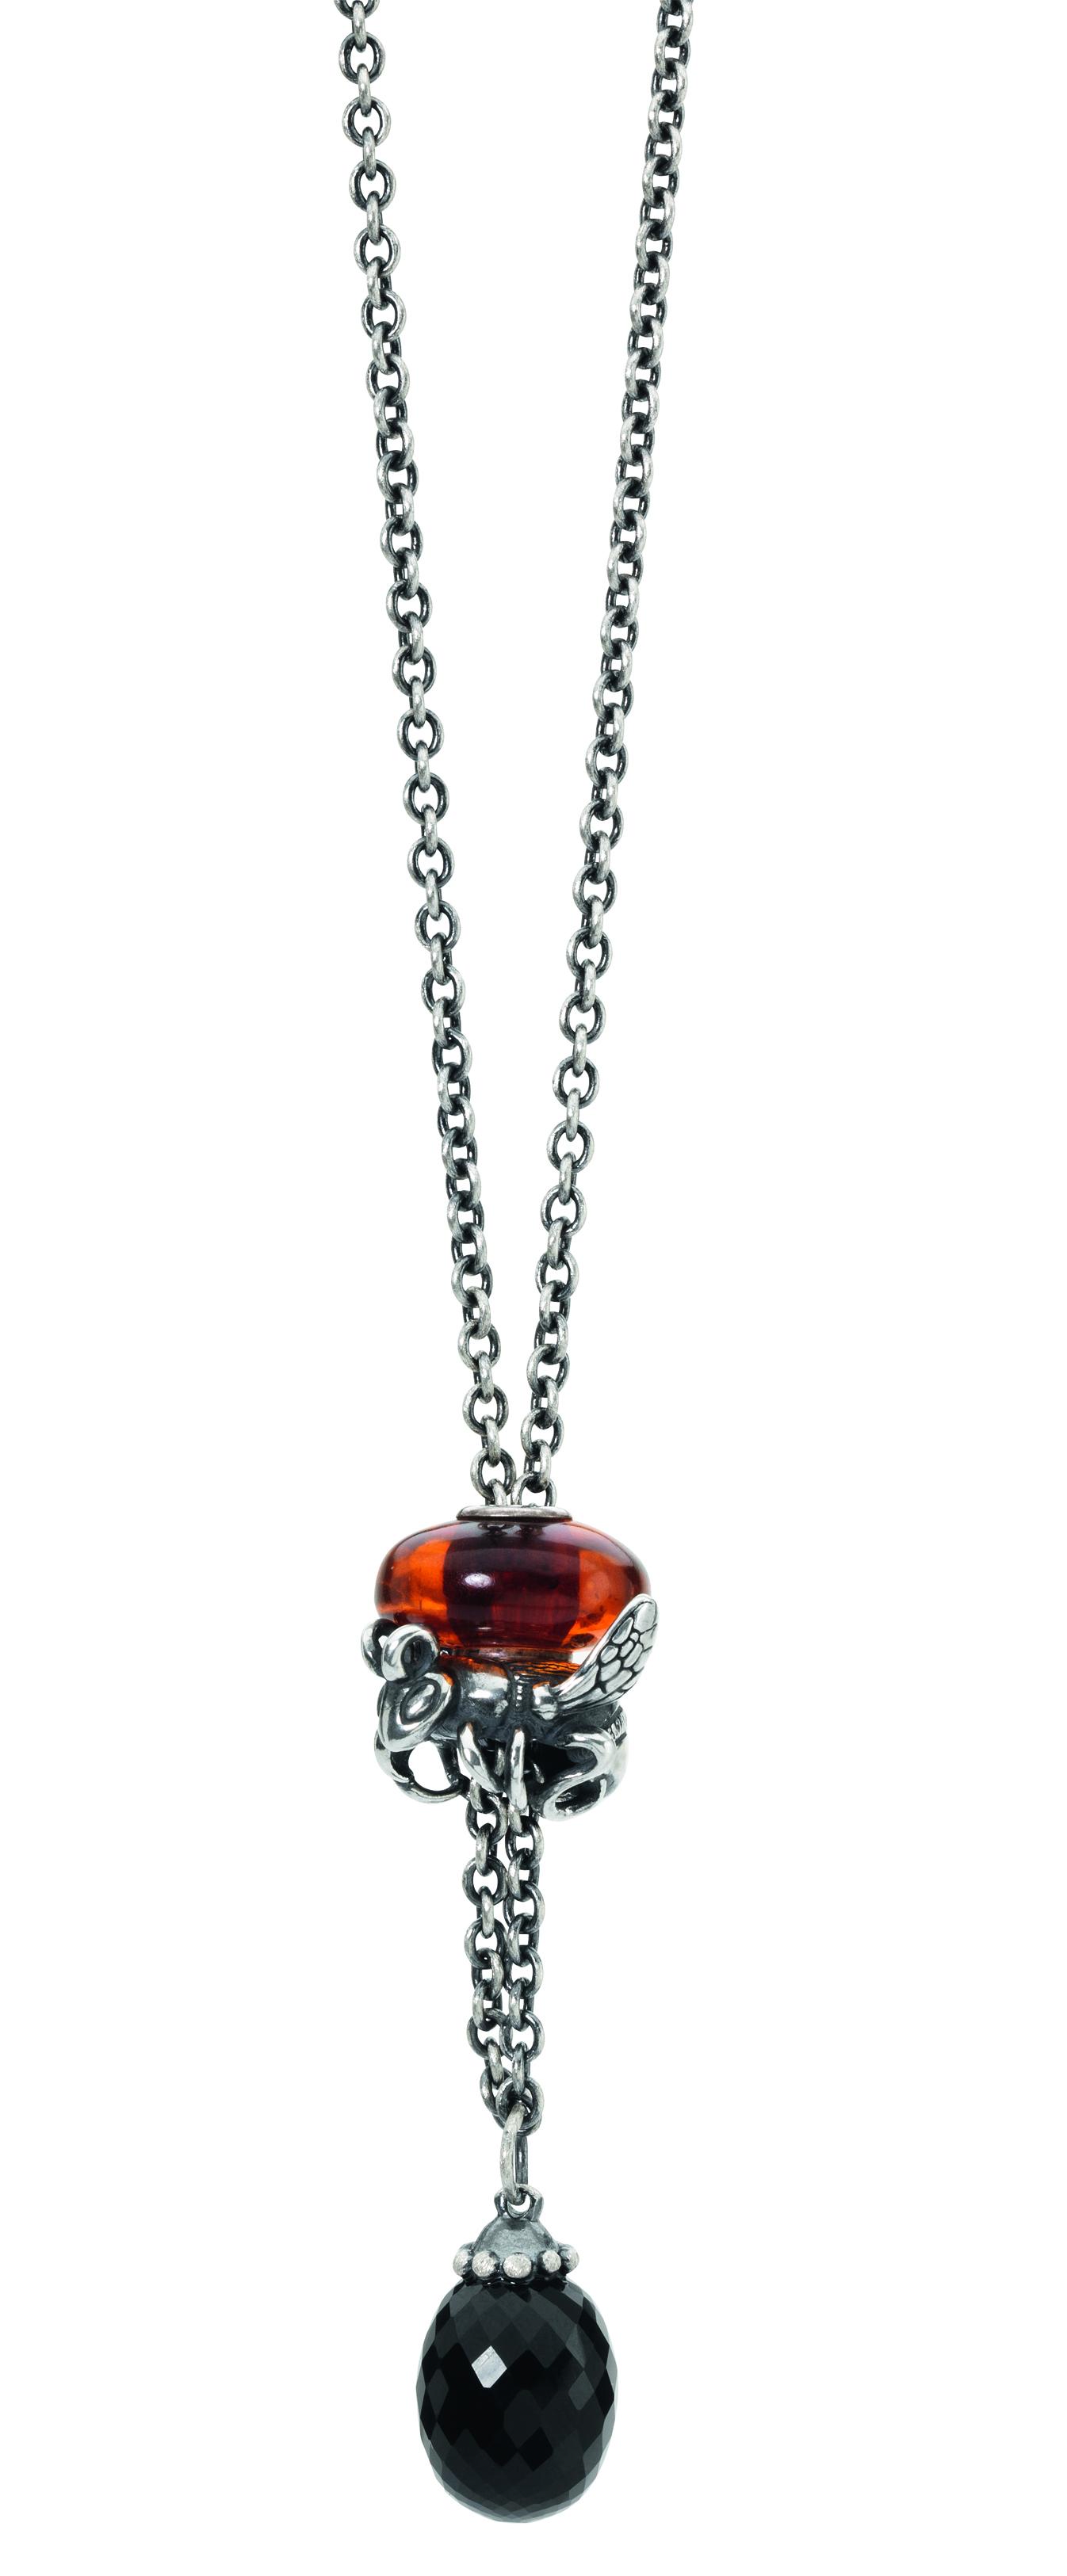 SB_16-02_collana fantasia in argentoe onice_composto con beads in argento e ambra